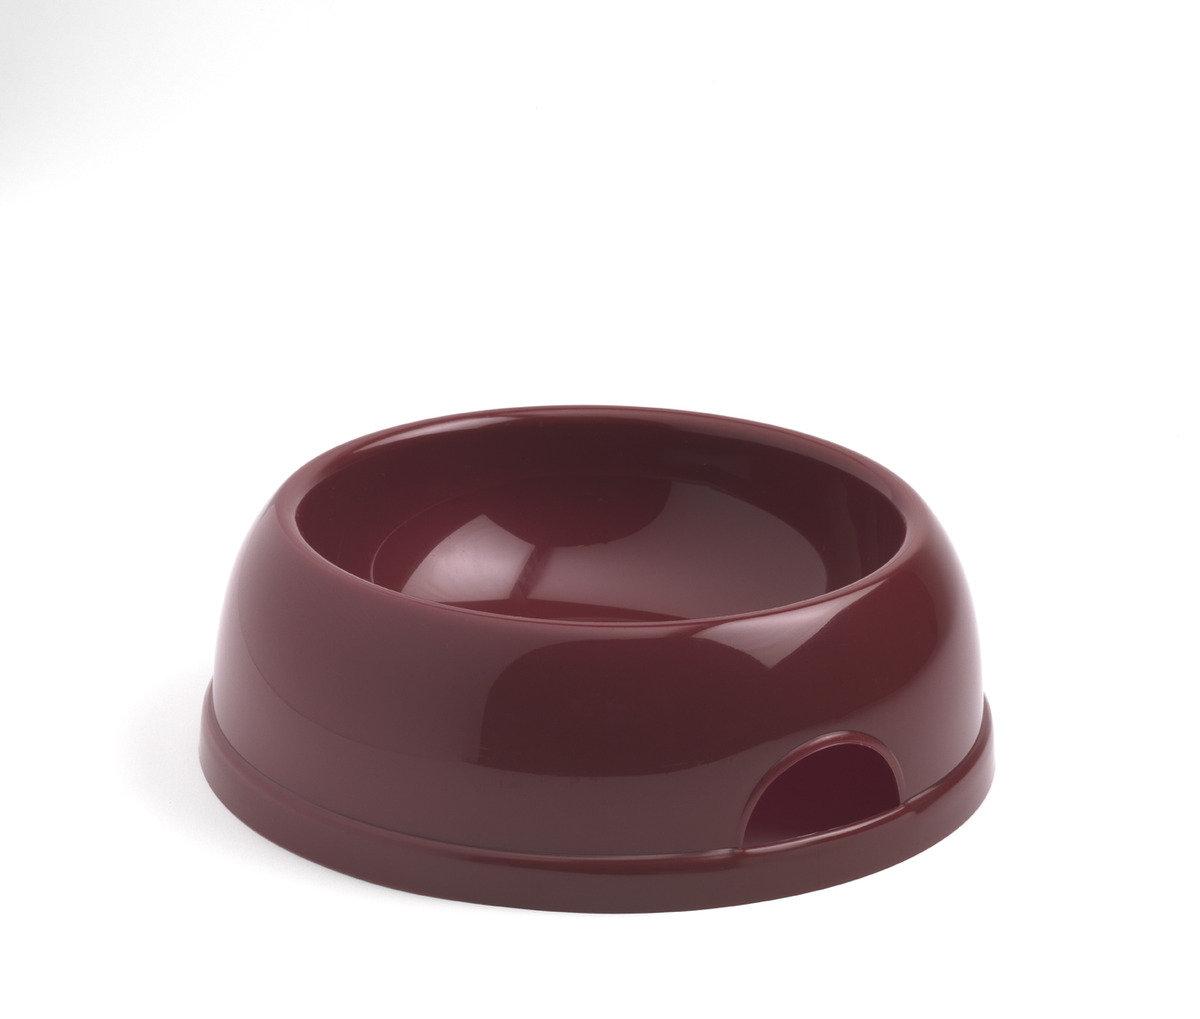 Eco Bowl  寵物碗 H113  - 深紅色